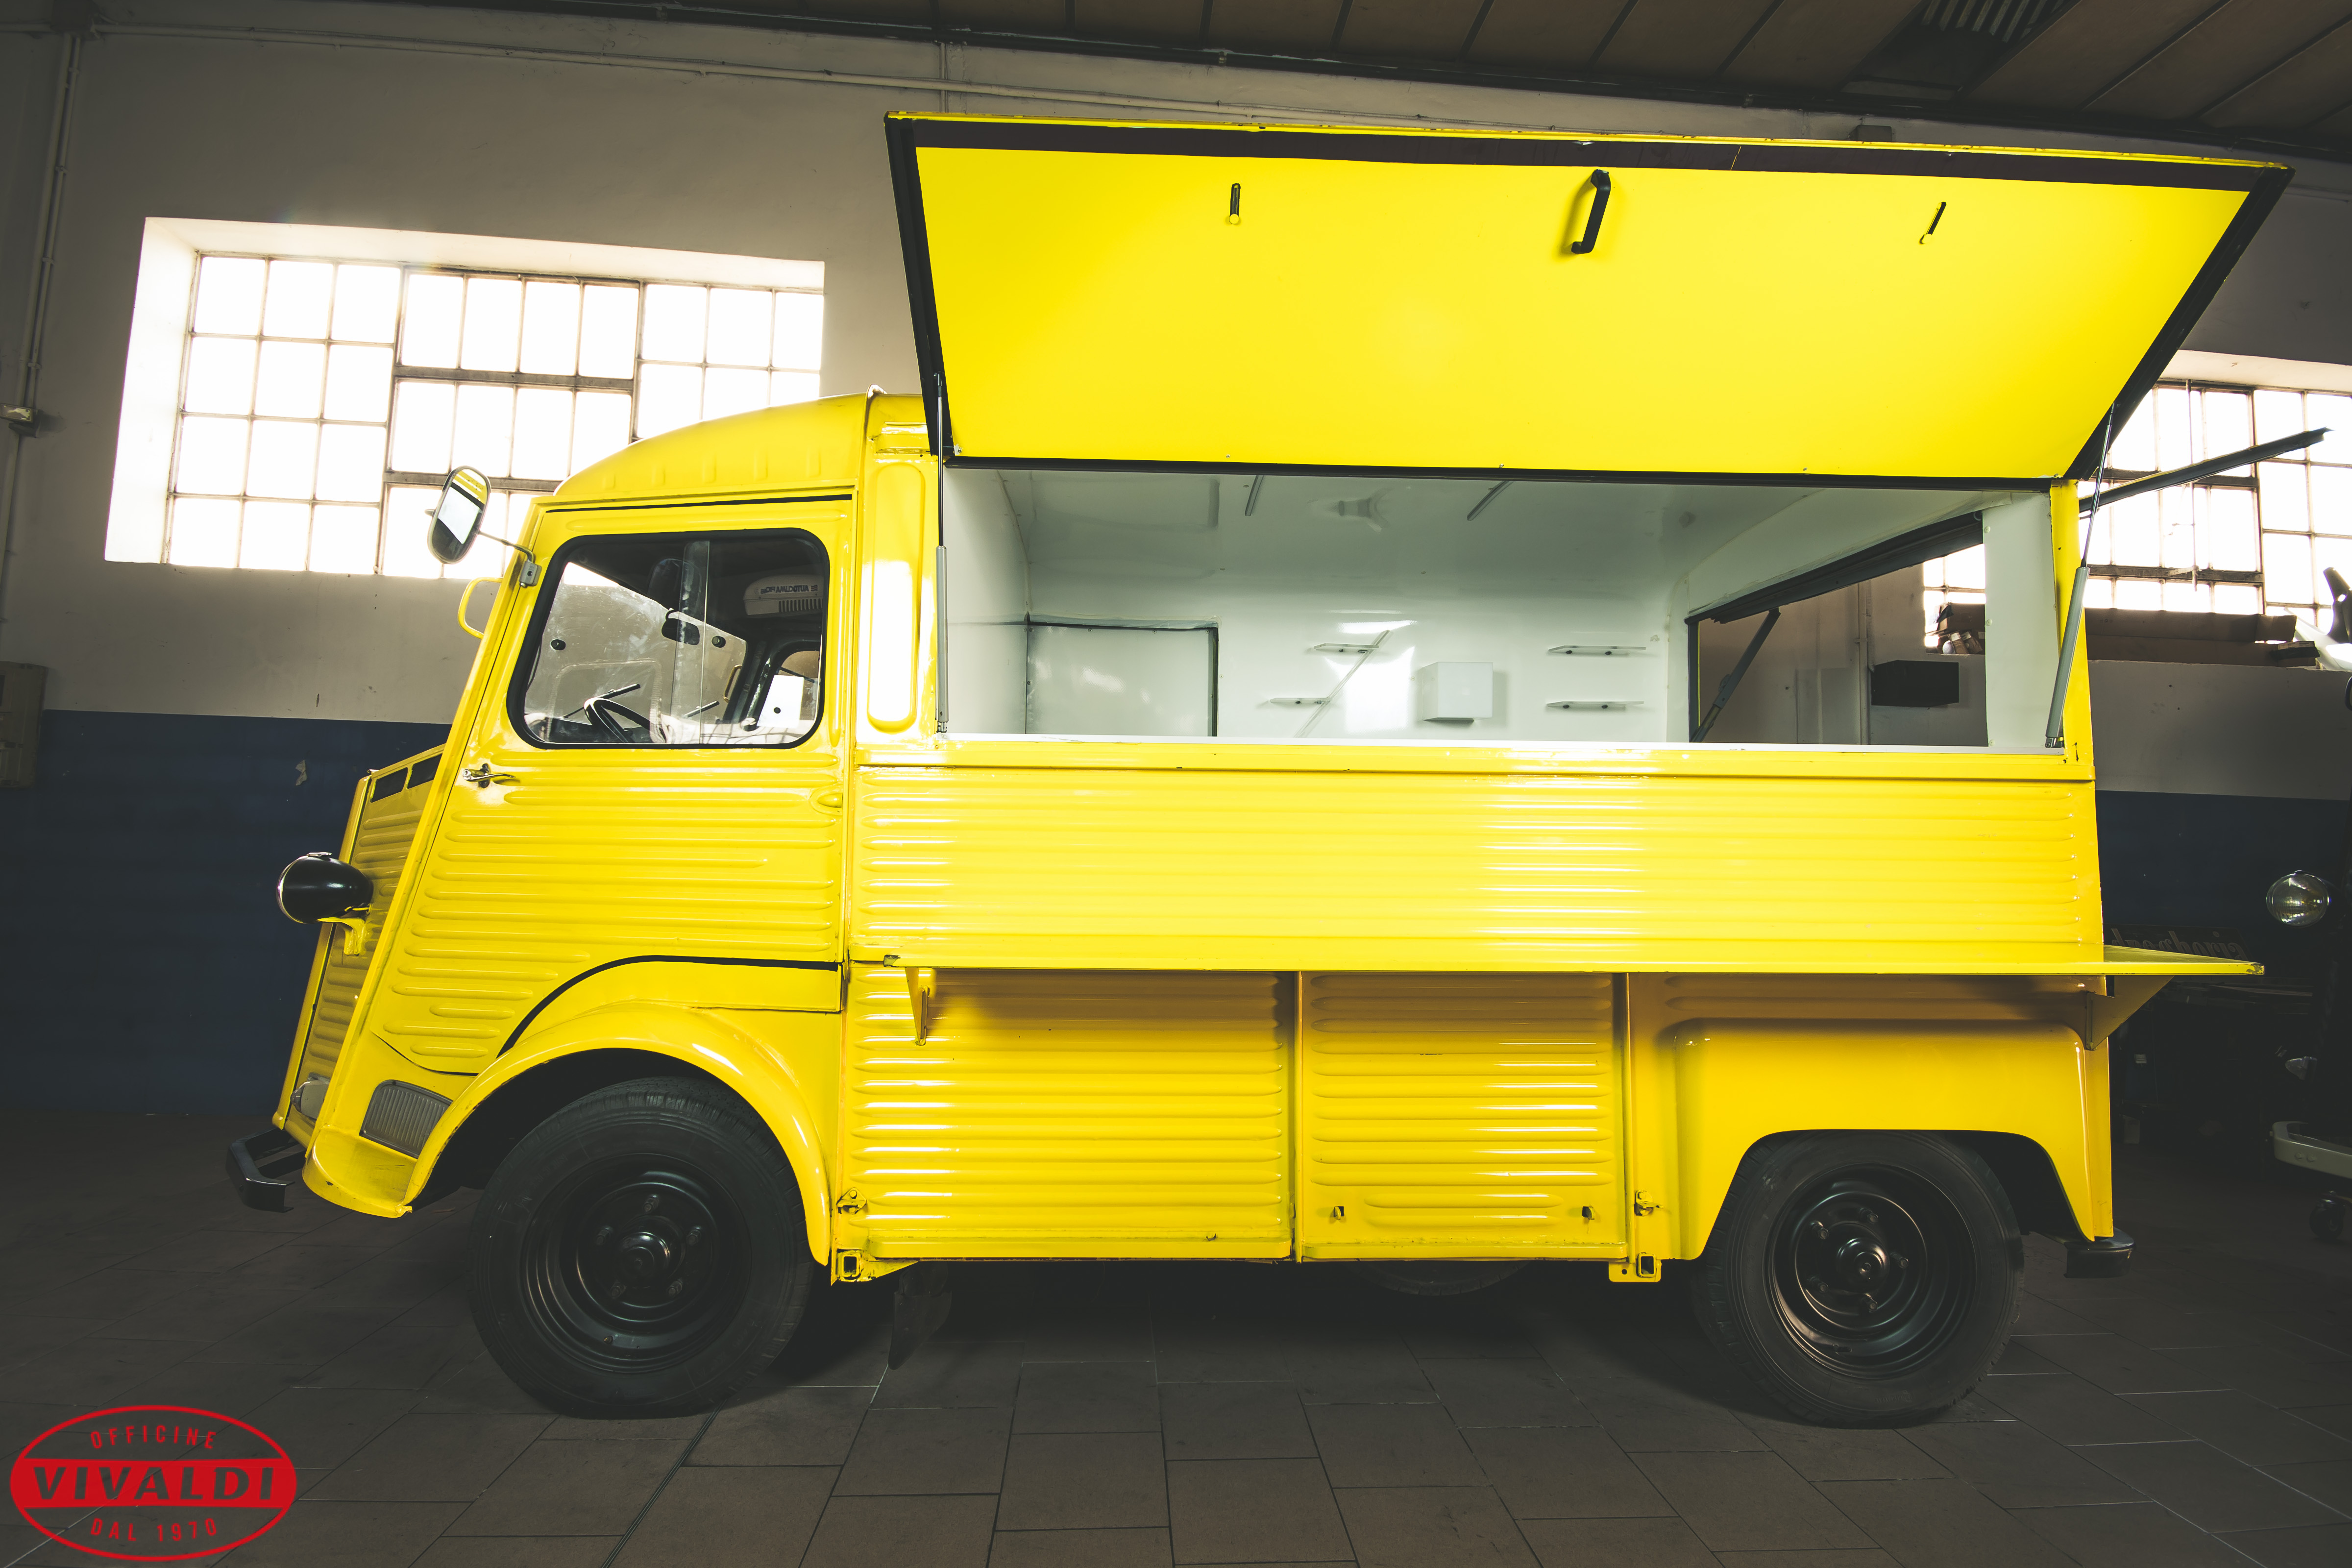 citroen HY truck by officine vivaldi 4